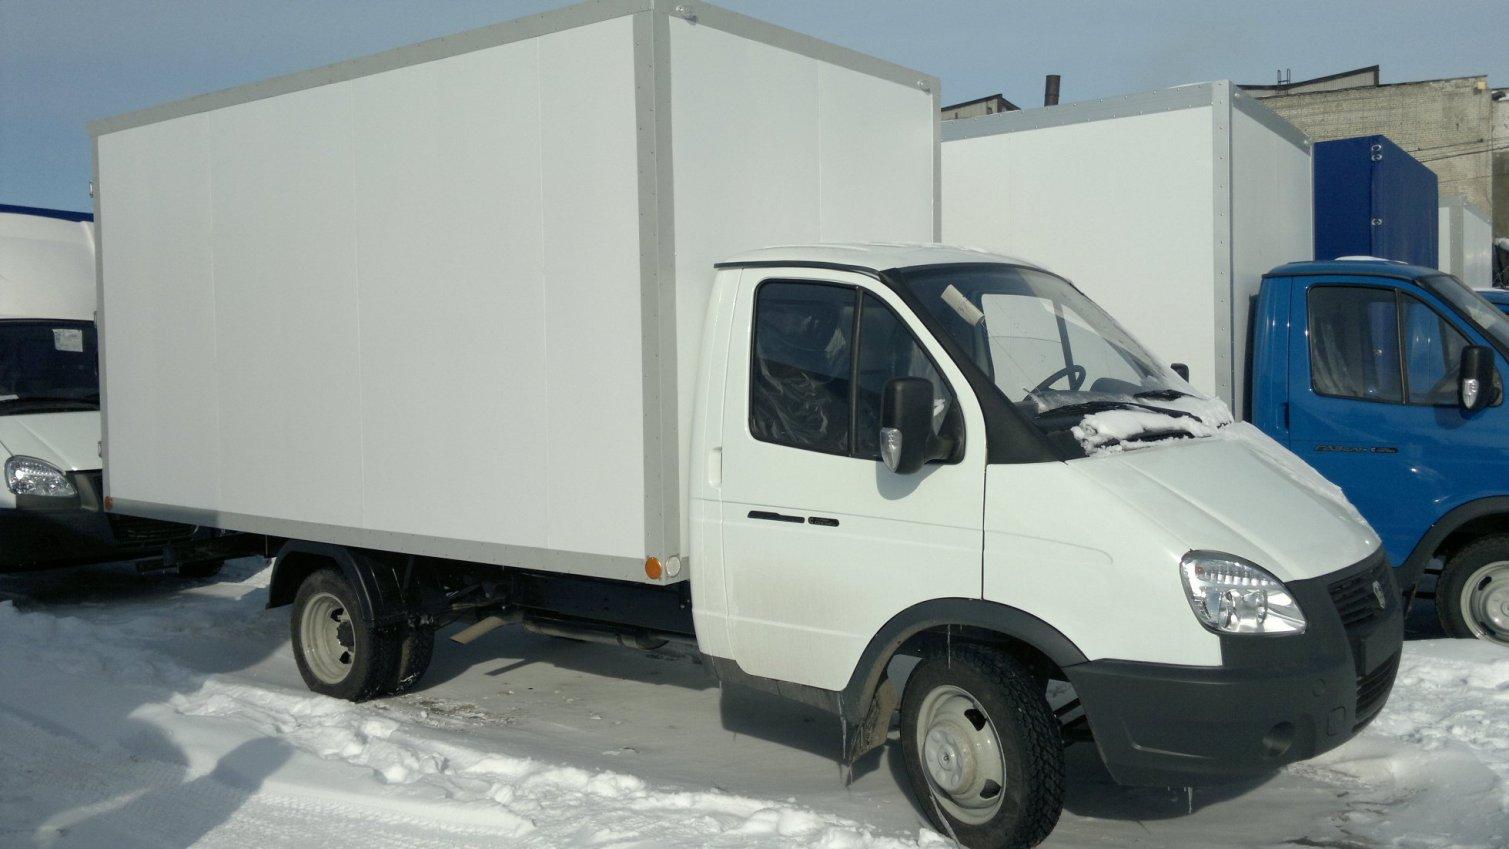 Купить фургон будку цельнометаллическую на газ бу цена фото 7